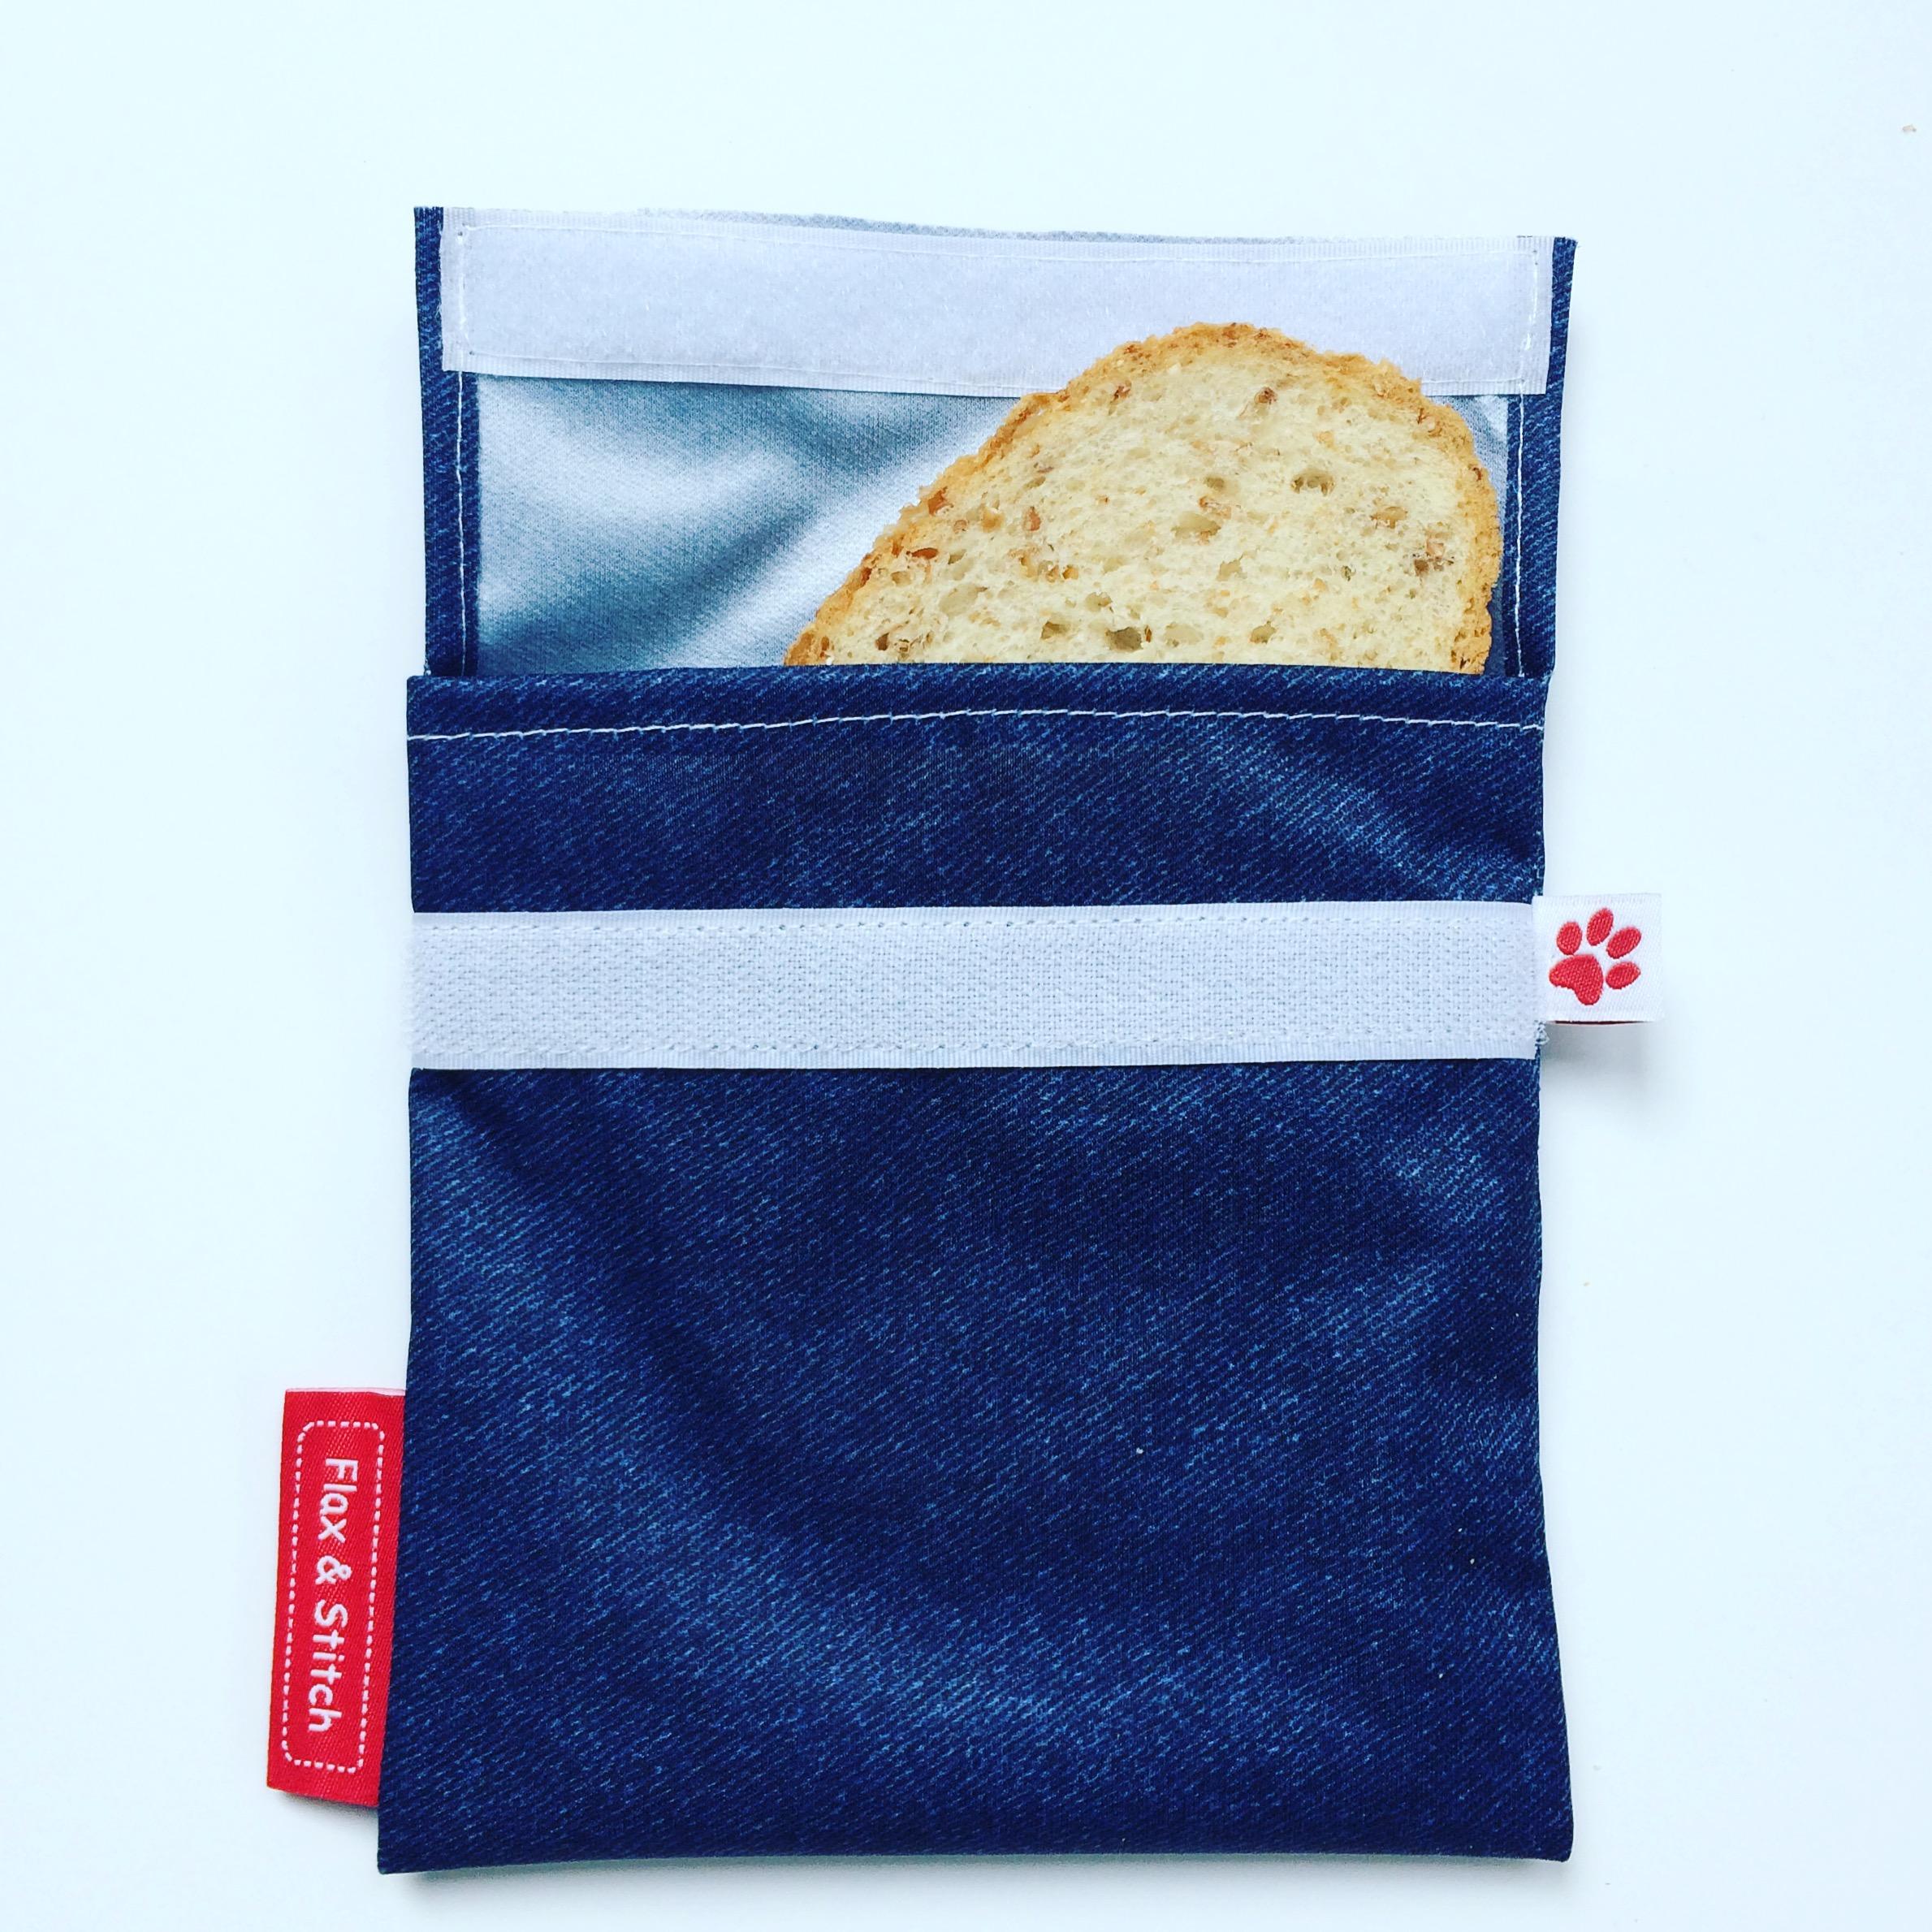 pochette snack flax & stitch